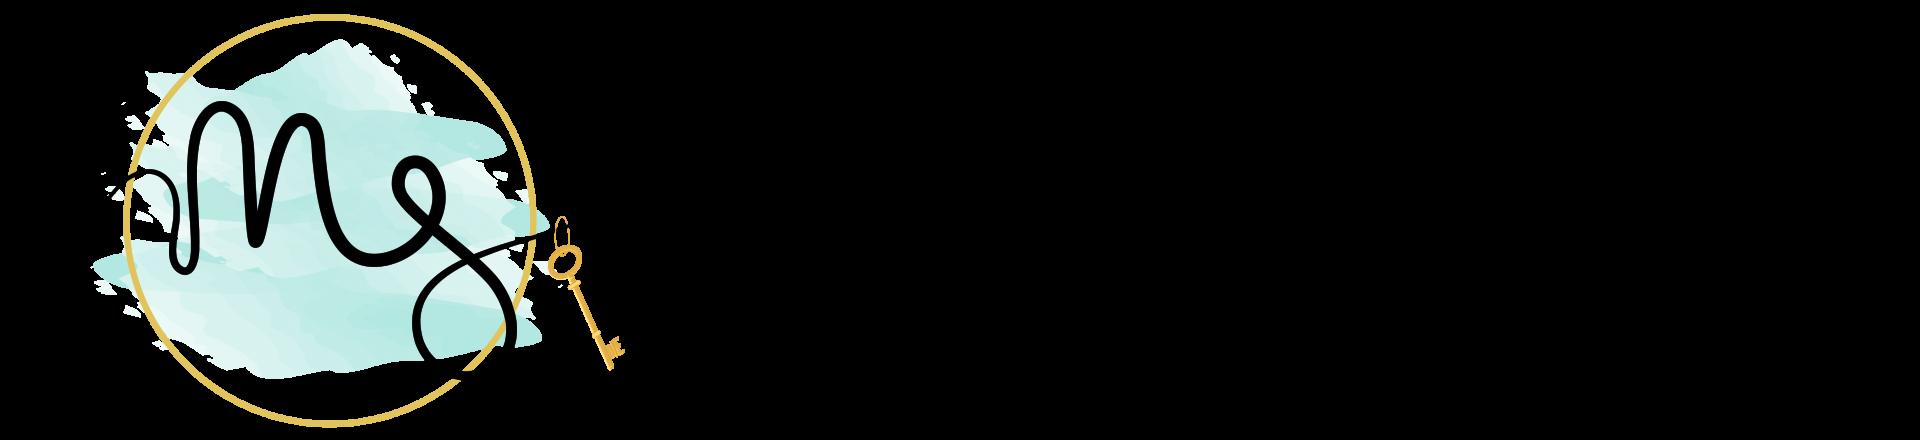 Mary Simpson, REALTOR® JBRE Group logo